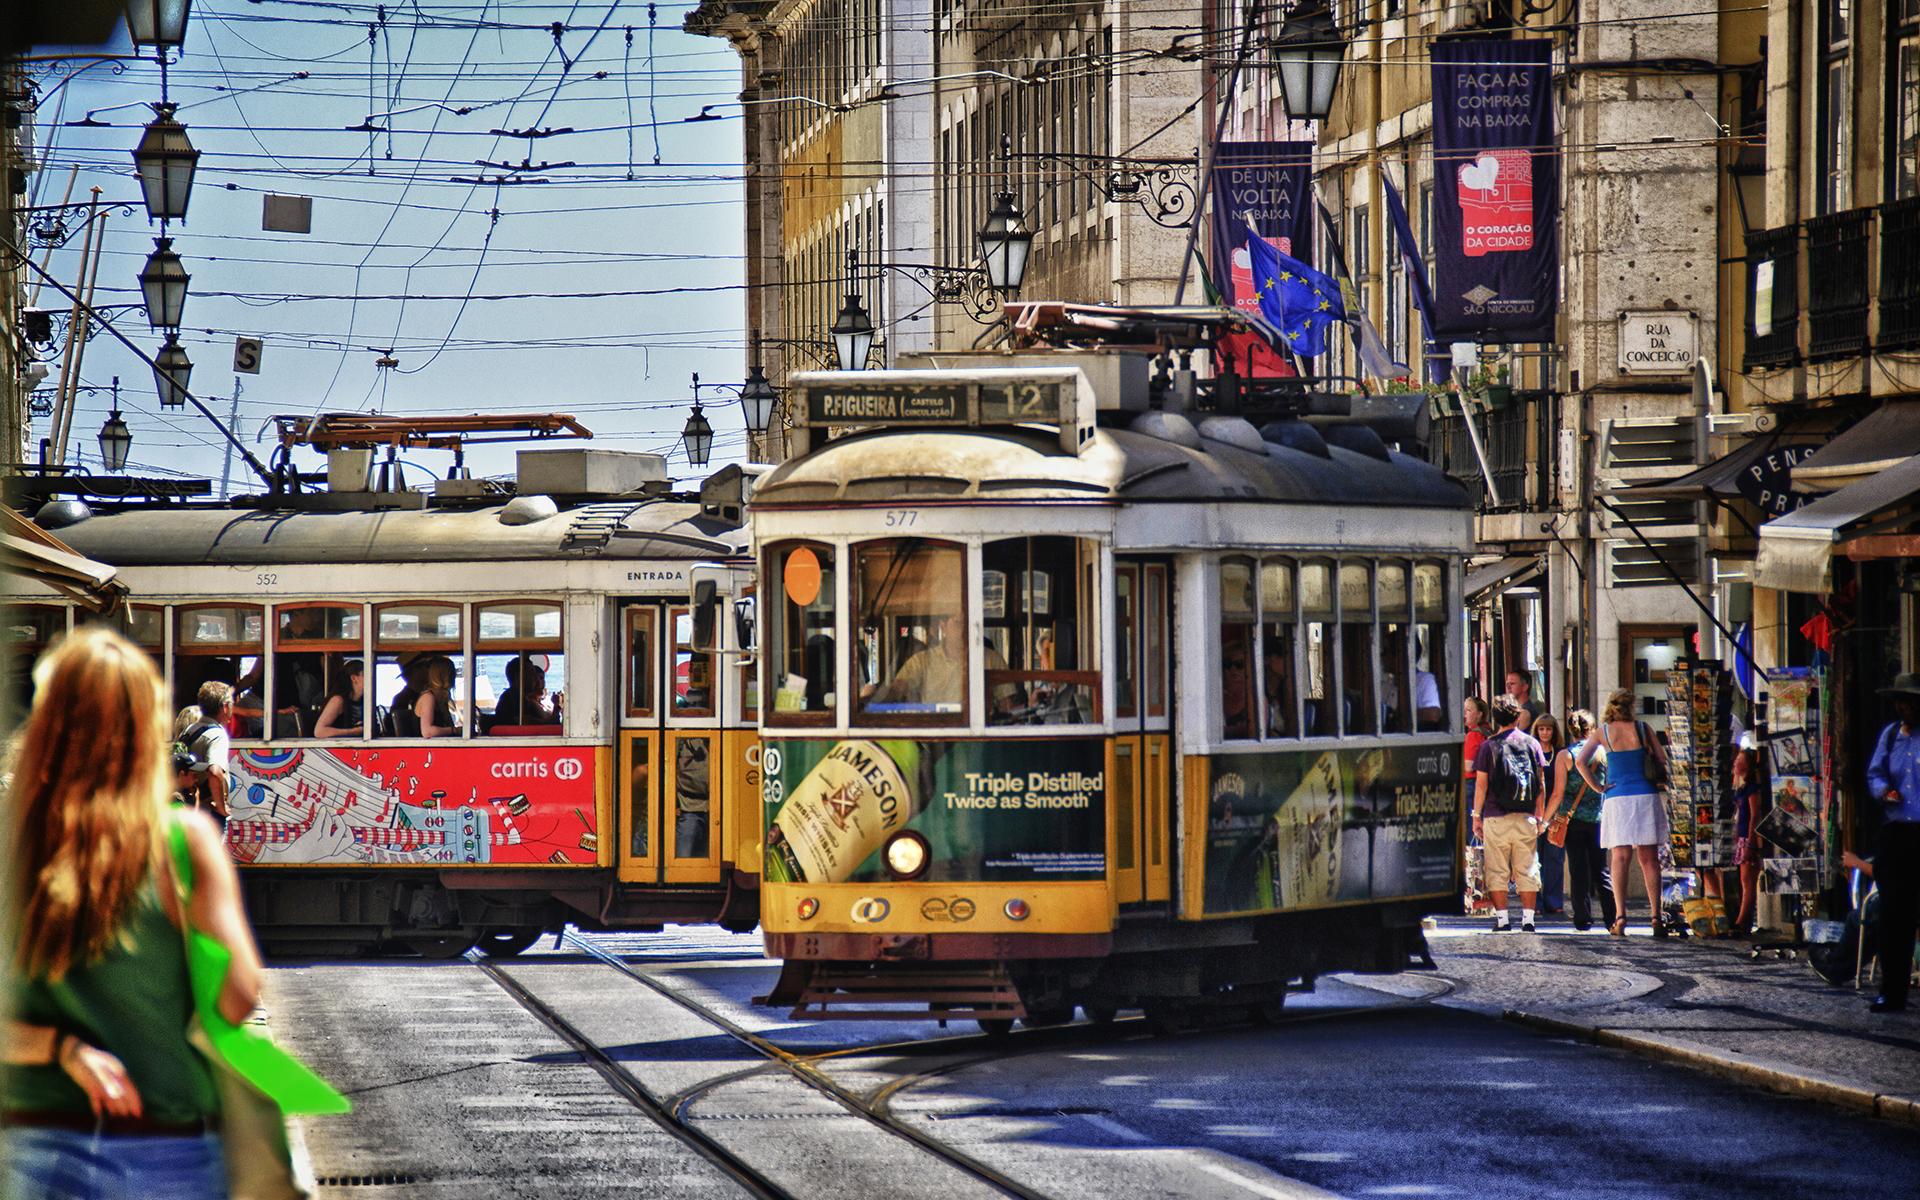 Streets of lisbon photo